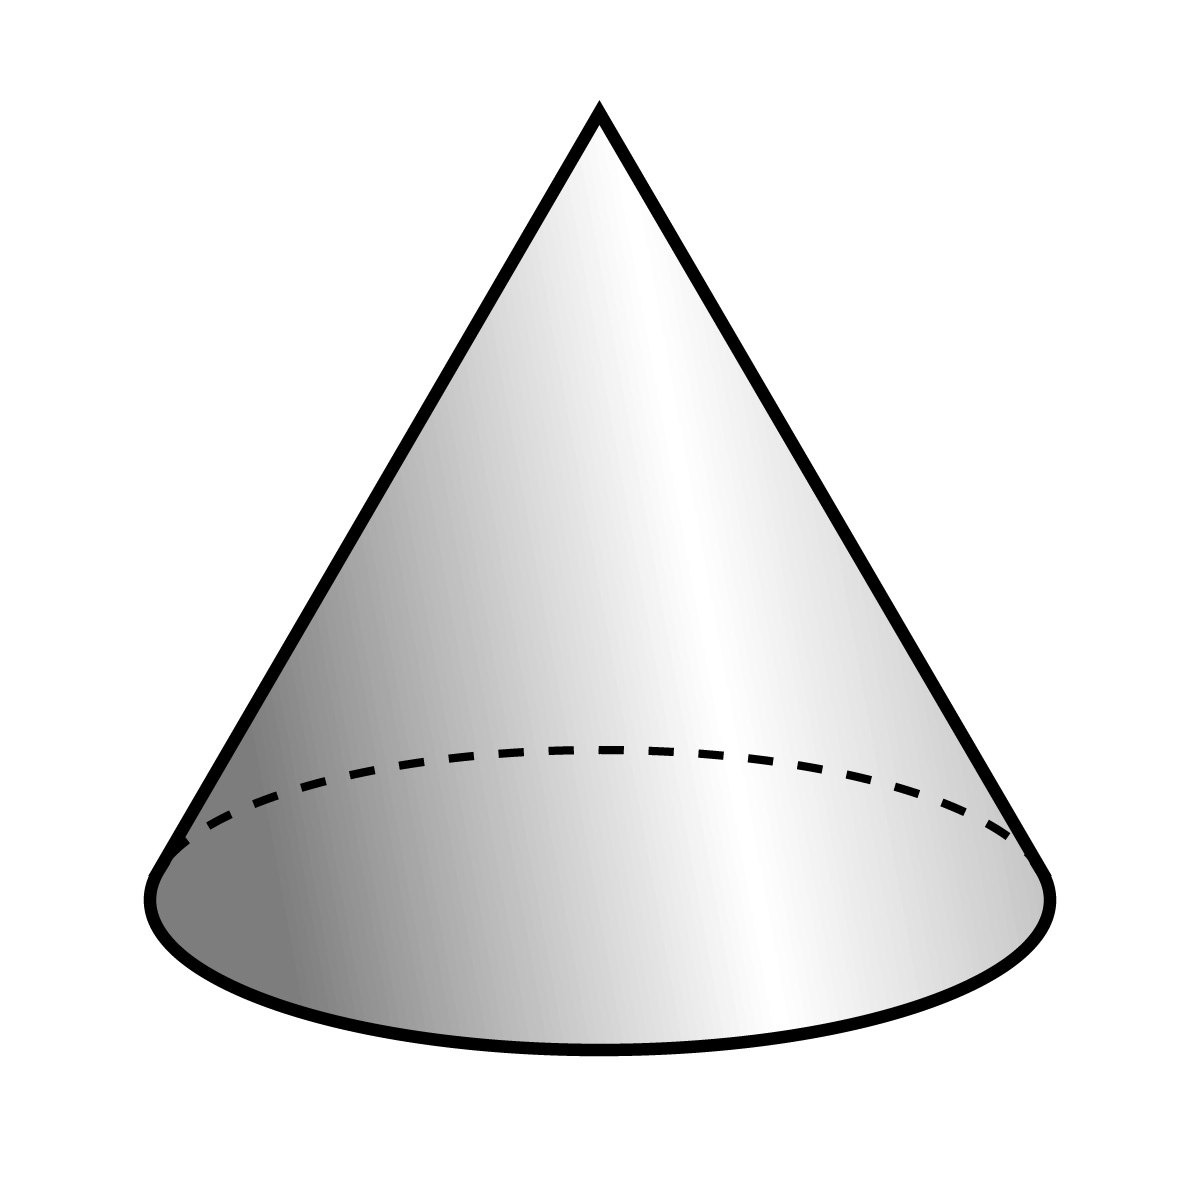 3d Rectangular Prism Clipart - Clipart Kid